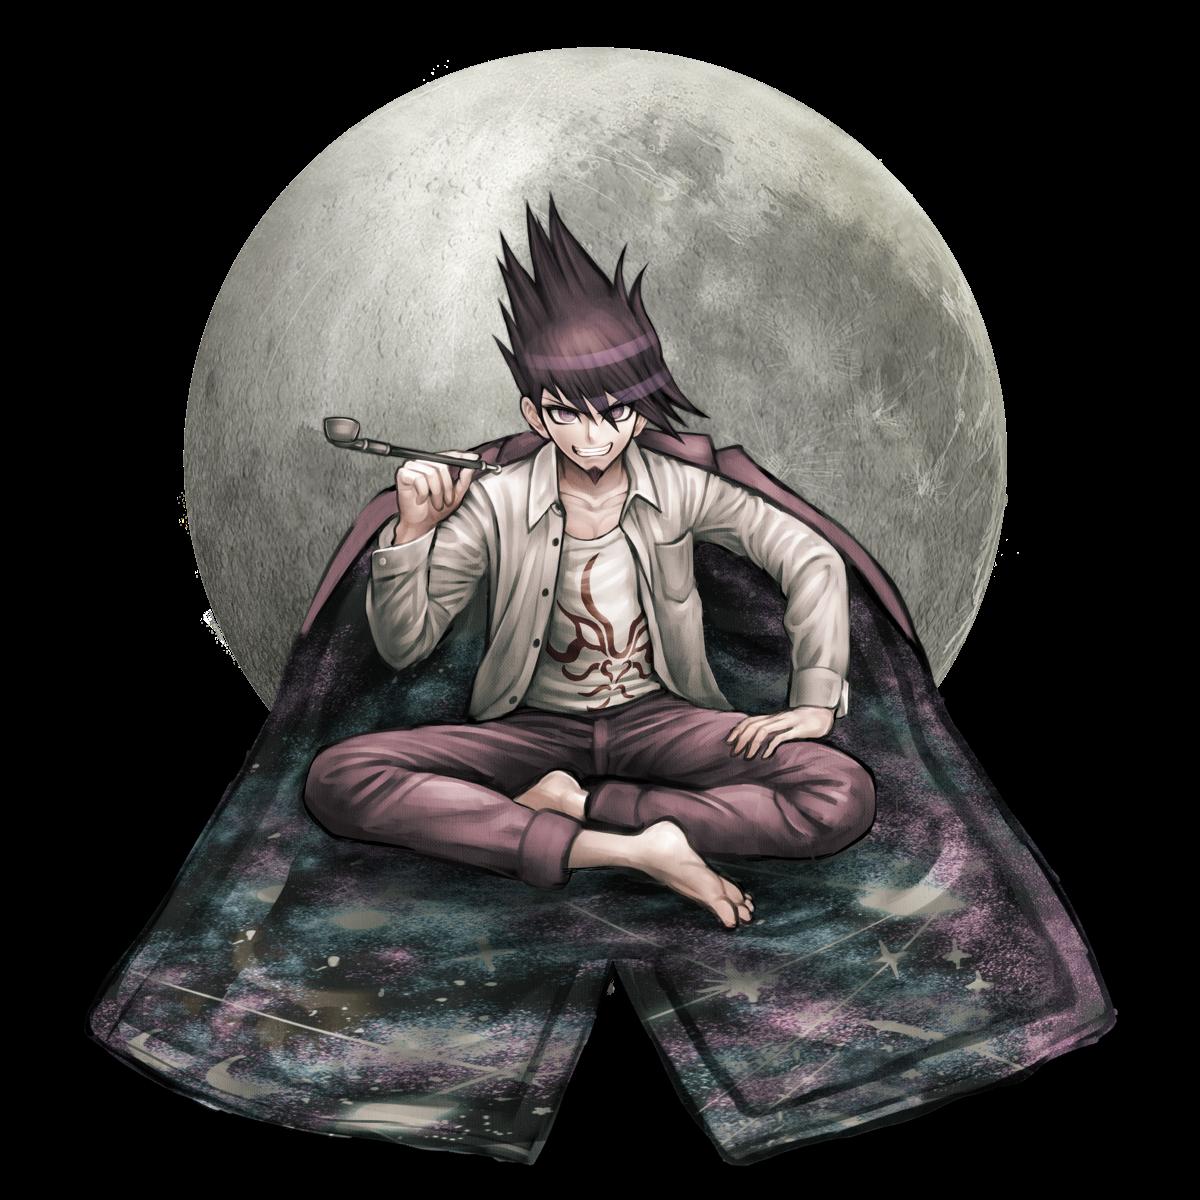 Kaito Momota | Danganronpa Wiki | FANDOM powered by Wikia